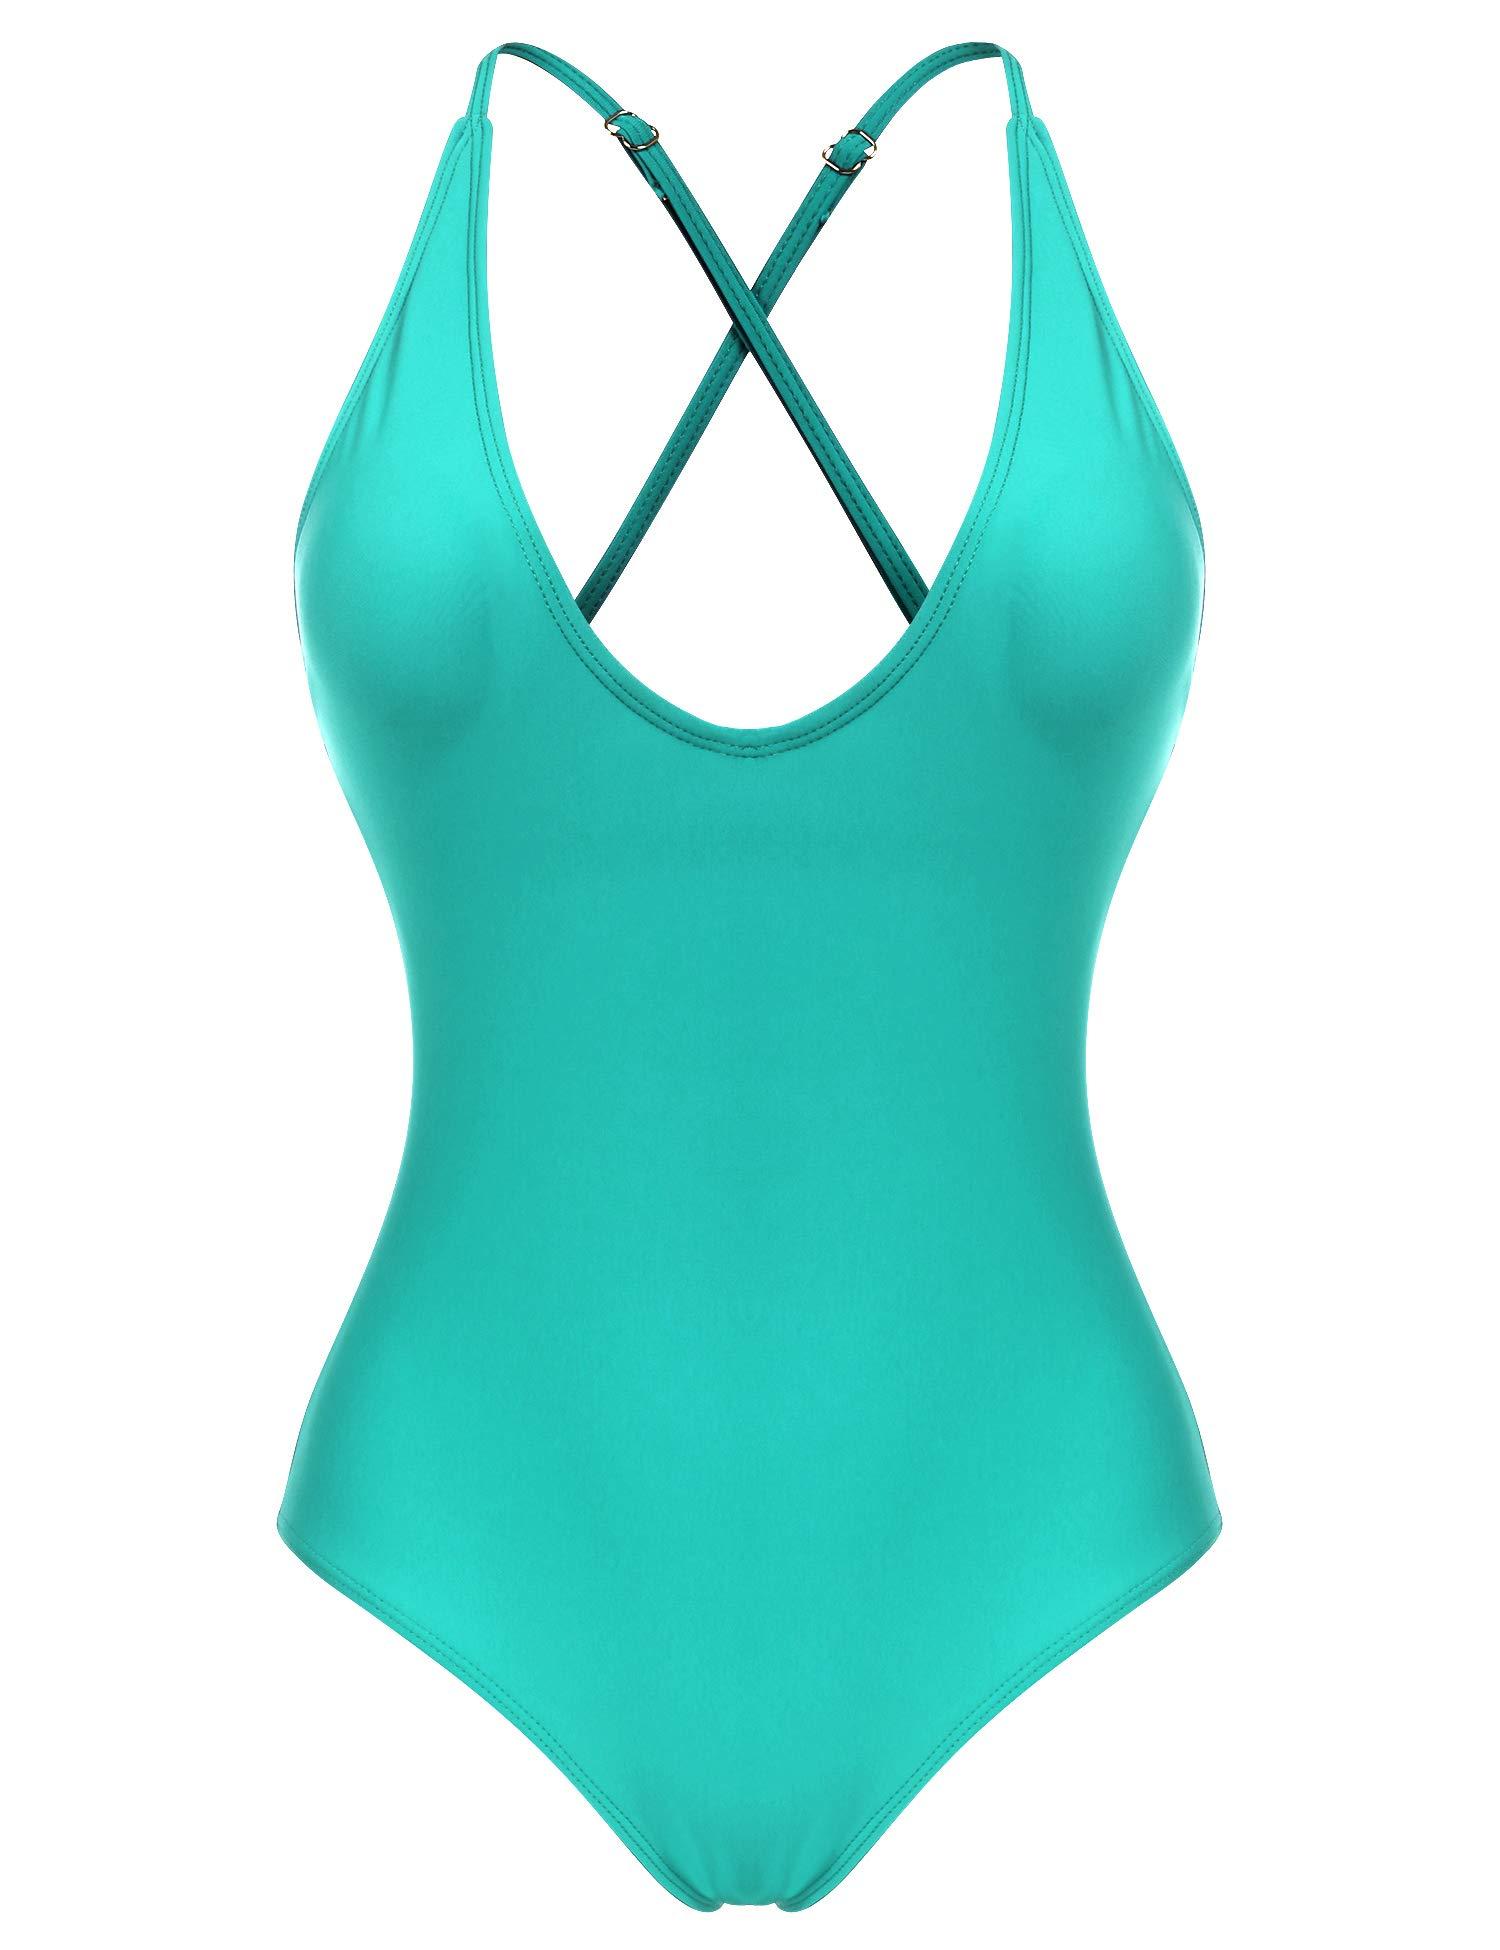 Ekouaer Women Sexy One Piece Swimsuit Straps Back Cross Monokini Bathing Suit S-XXL